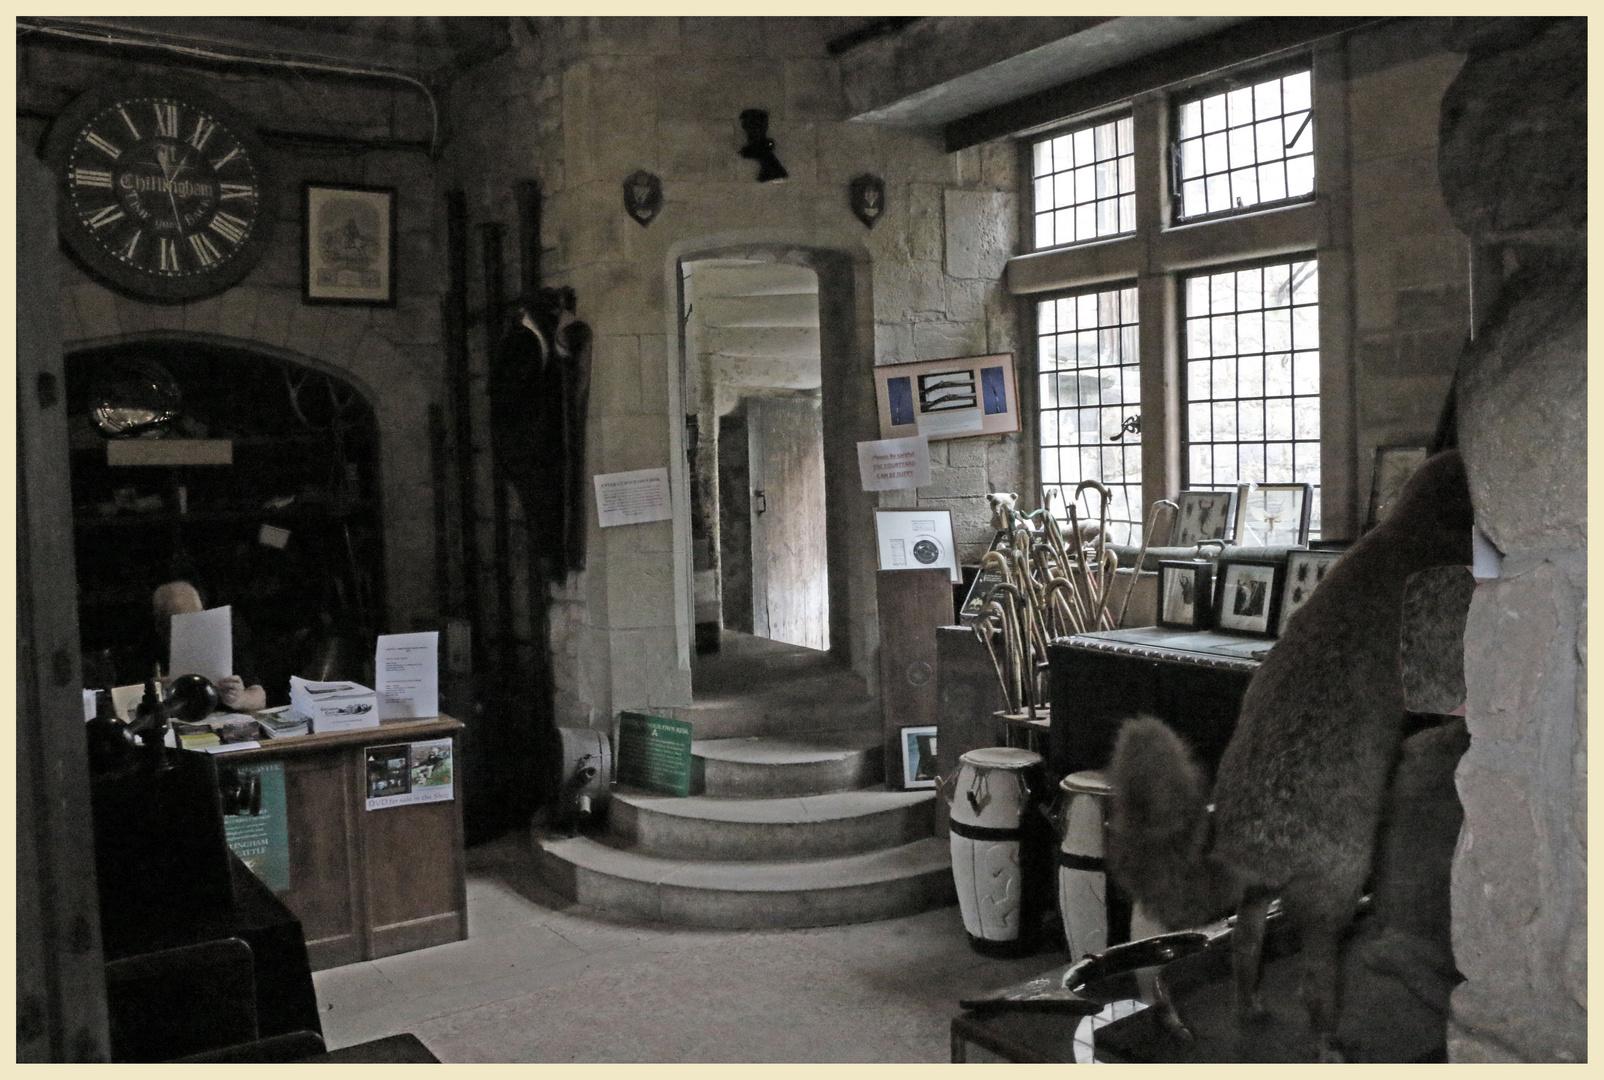 Chillingham castle entrance room 1b